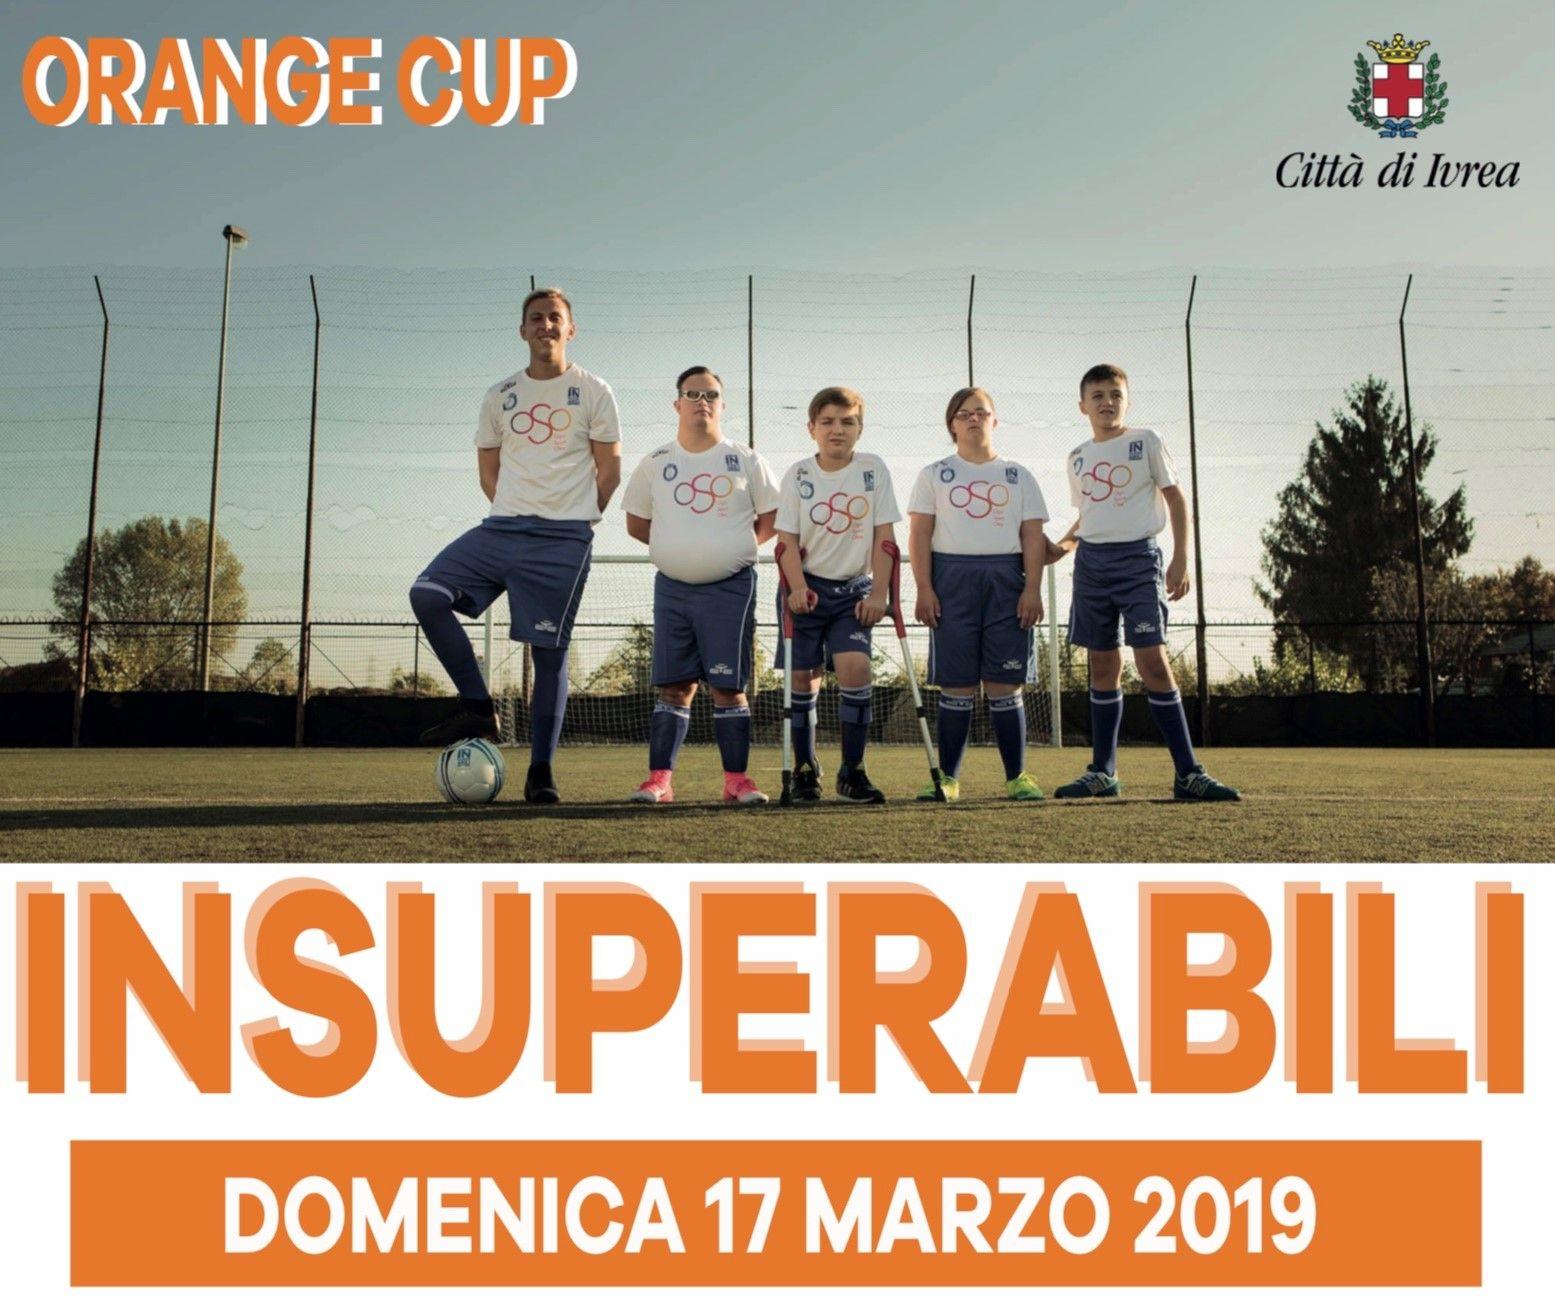 CALCIO - Domenica l'Orange Cup per l'associazione «Insuperabili Onlus»